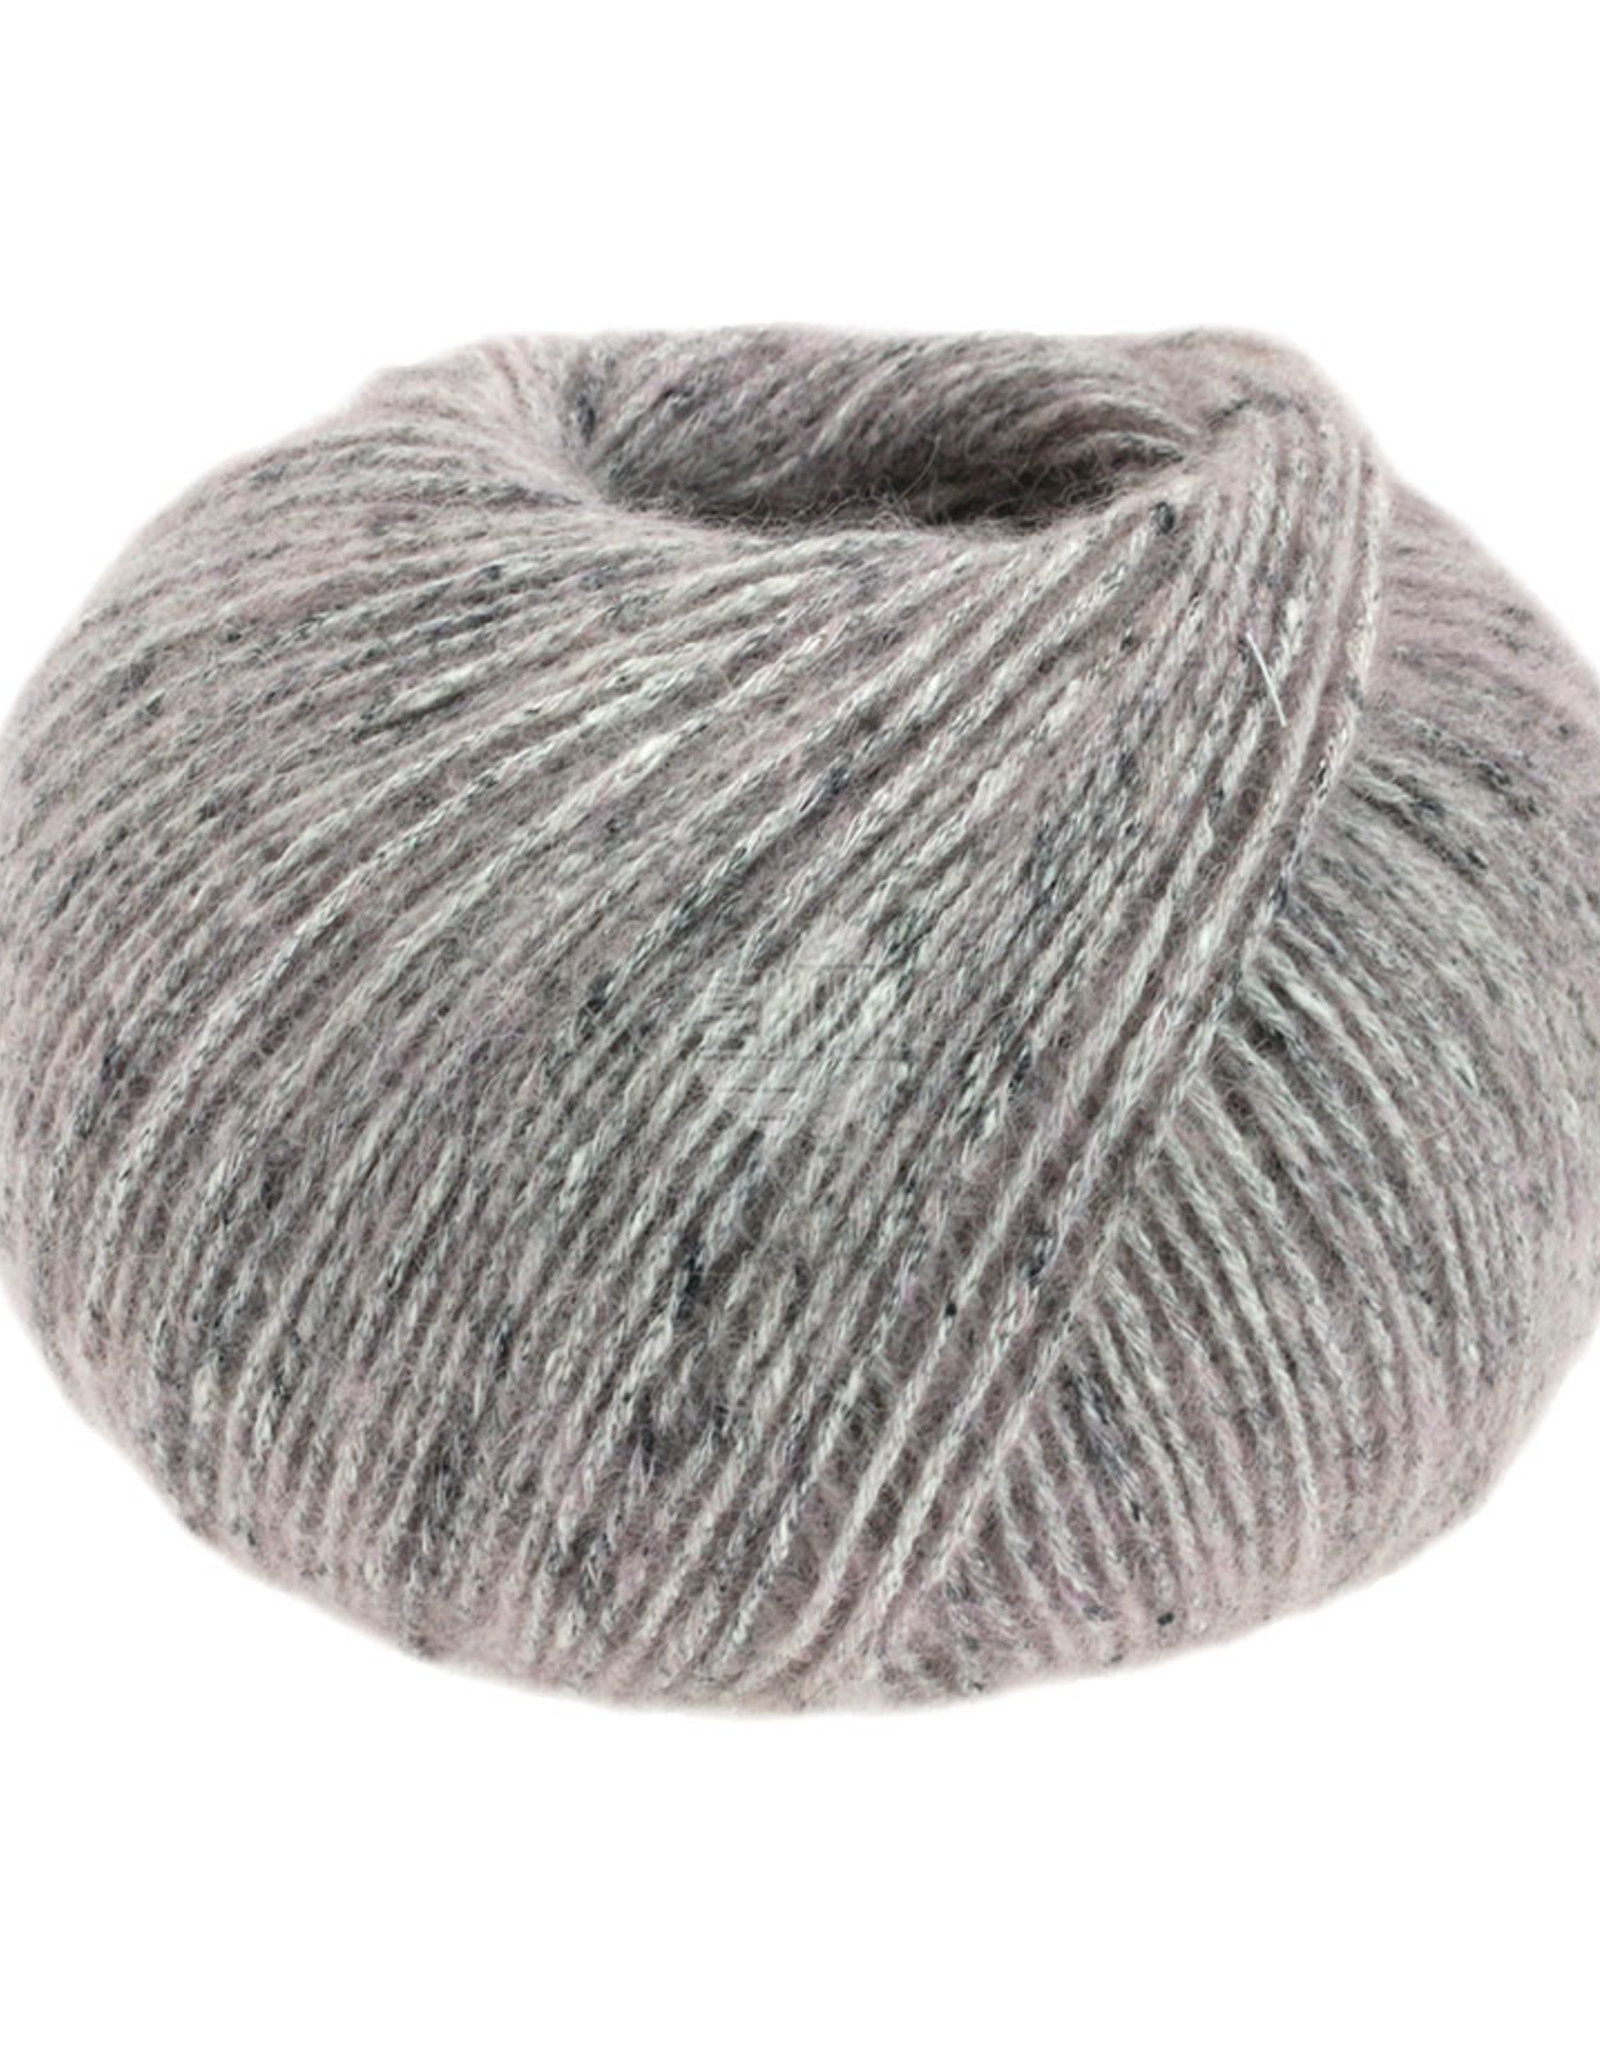 Lana Grossa Ecopuno Tweed Stola